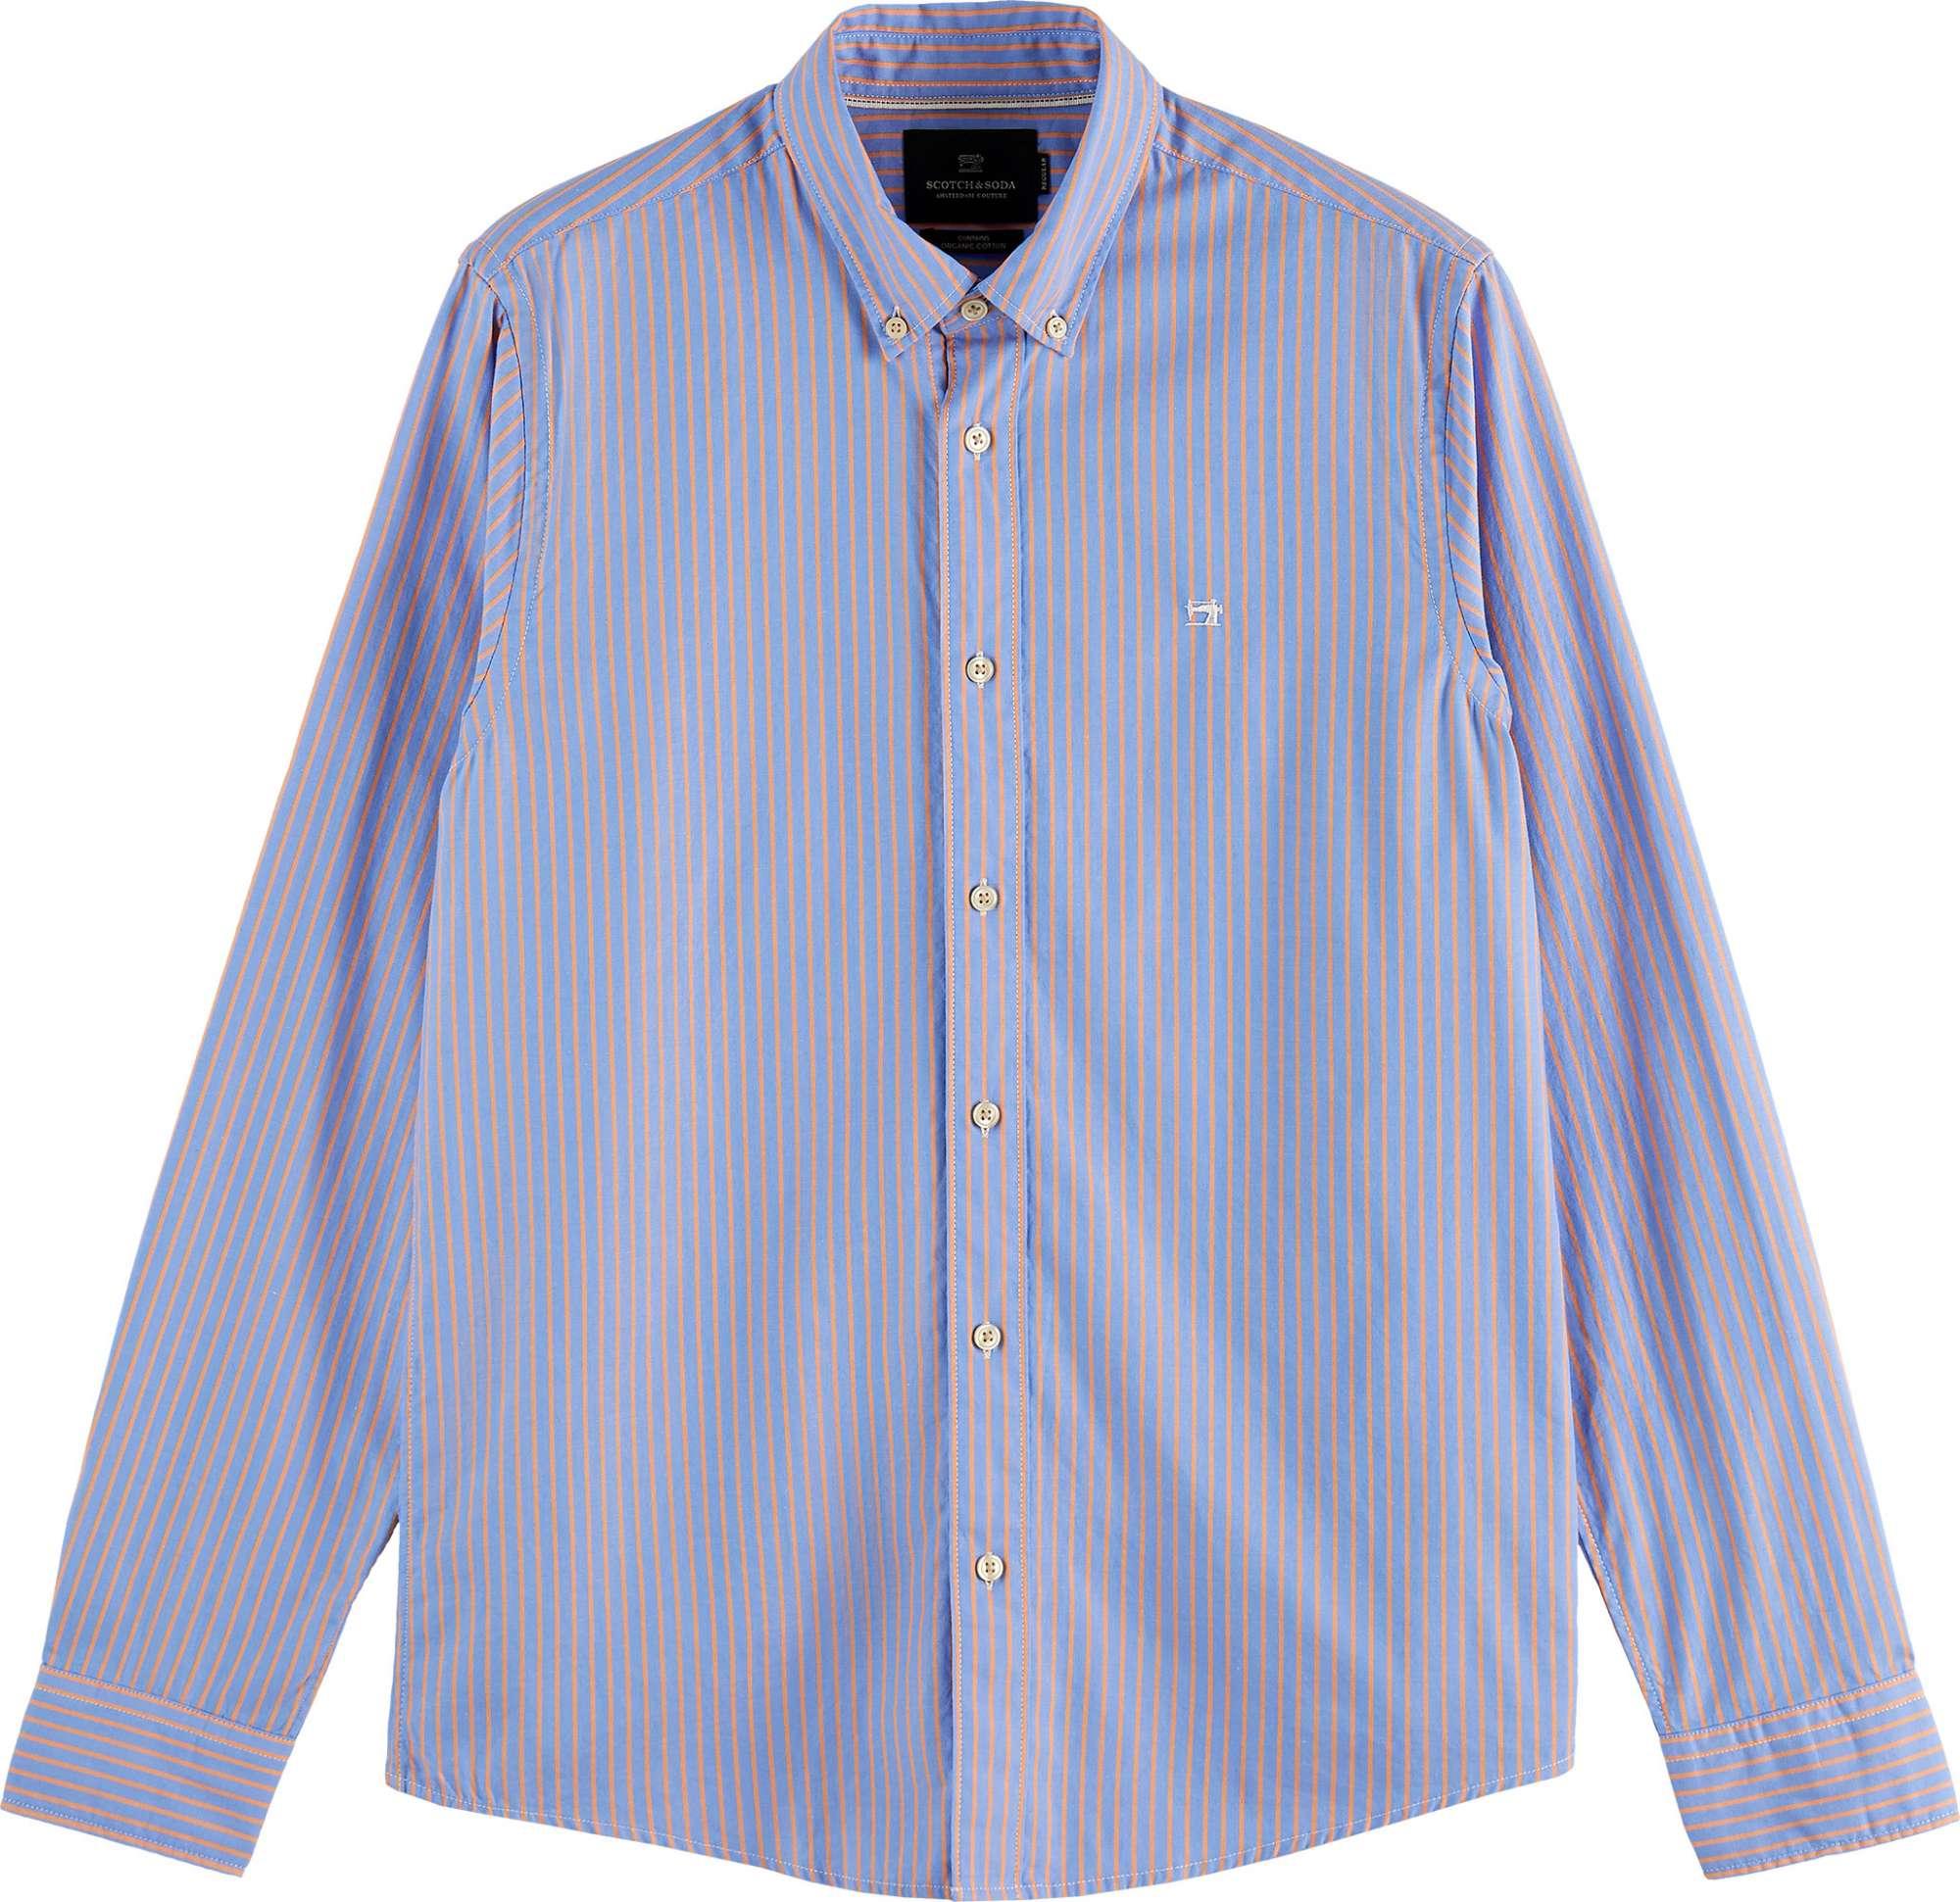 Striped oxford shirt i combo a